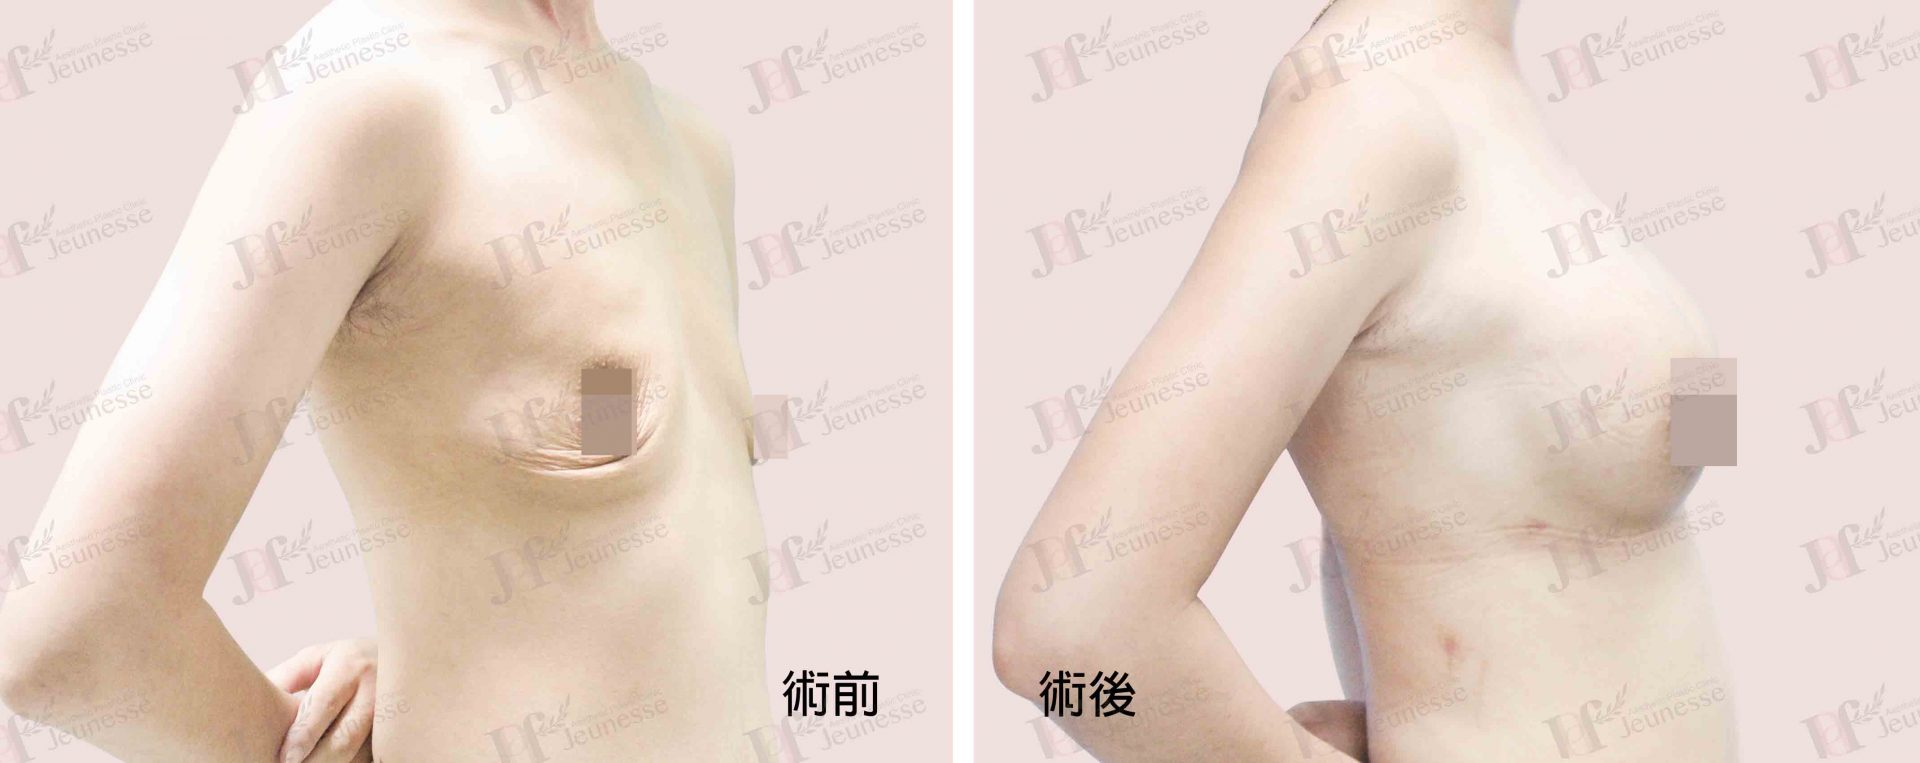 Breast Augmentation- Silicone implants -case2 側面-浮水印